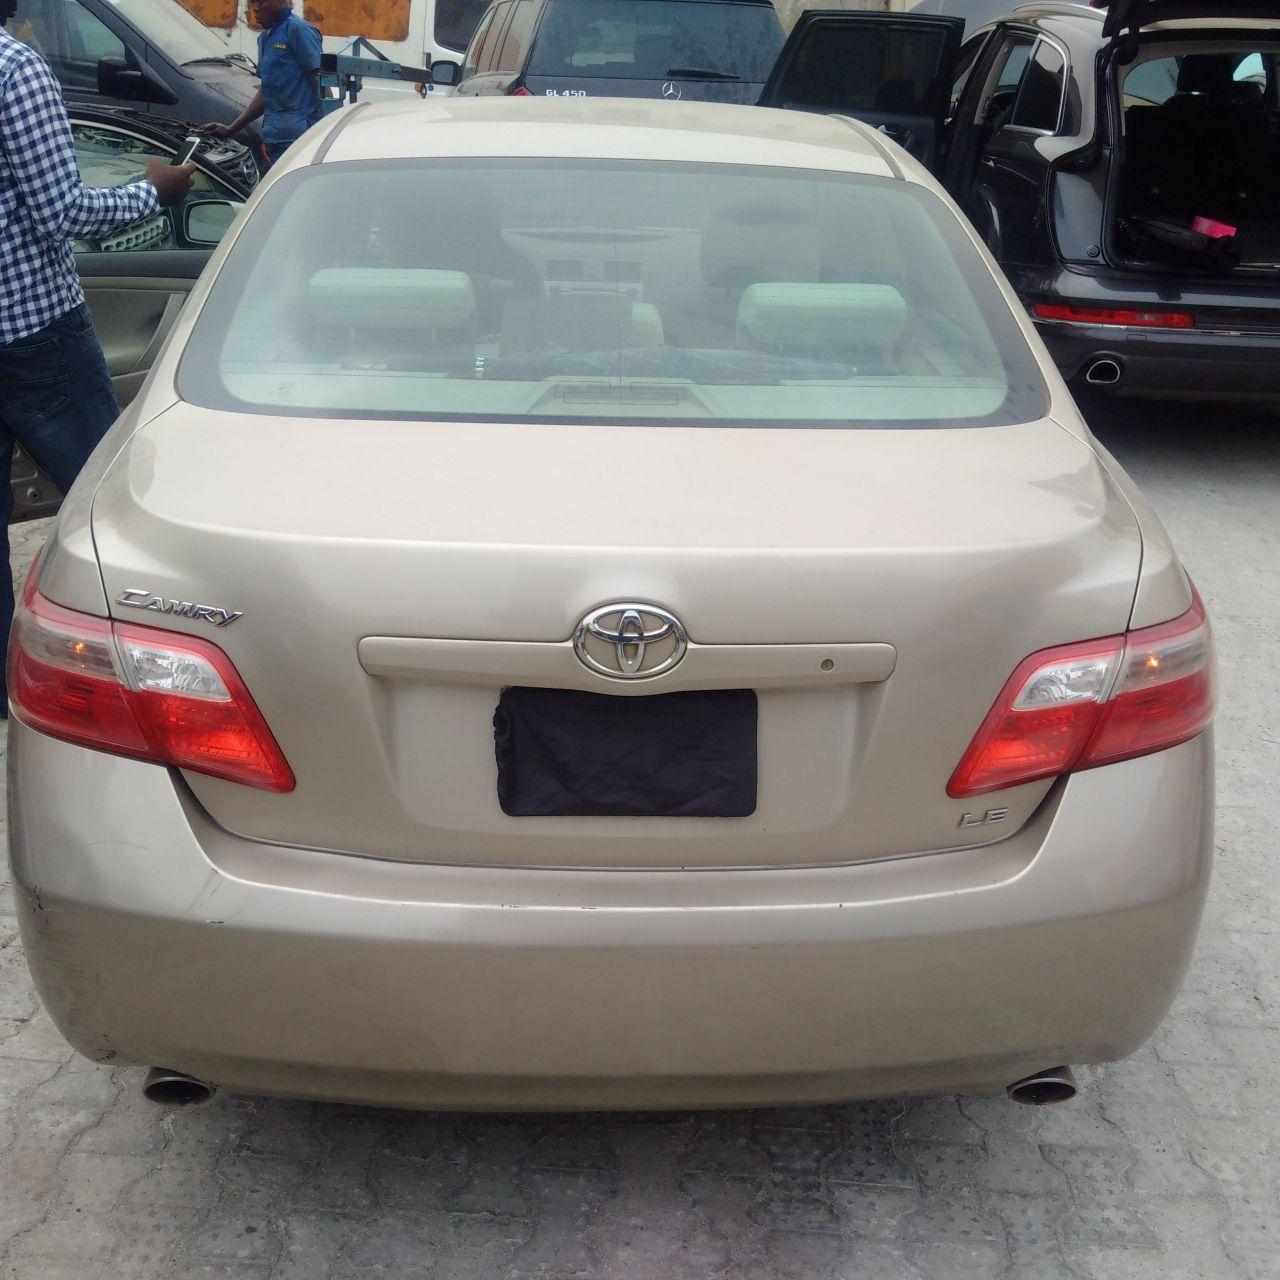 brand new toyota camry nigeria yaris heykers trd sportivo 2007 v6 registered autos